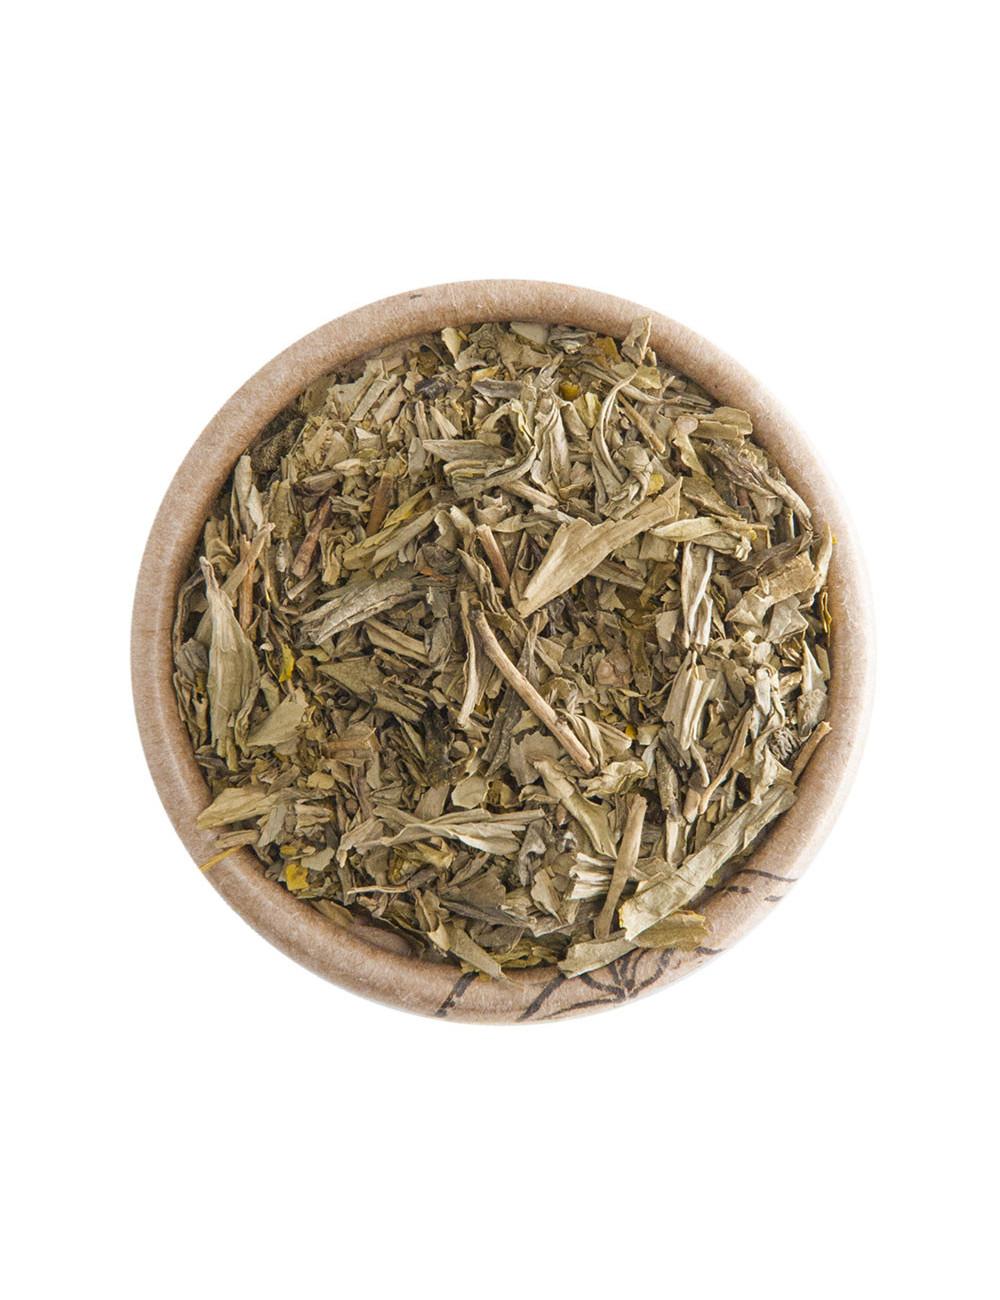 Deteinato BIO tè verde - La Pianta del Tè shop online